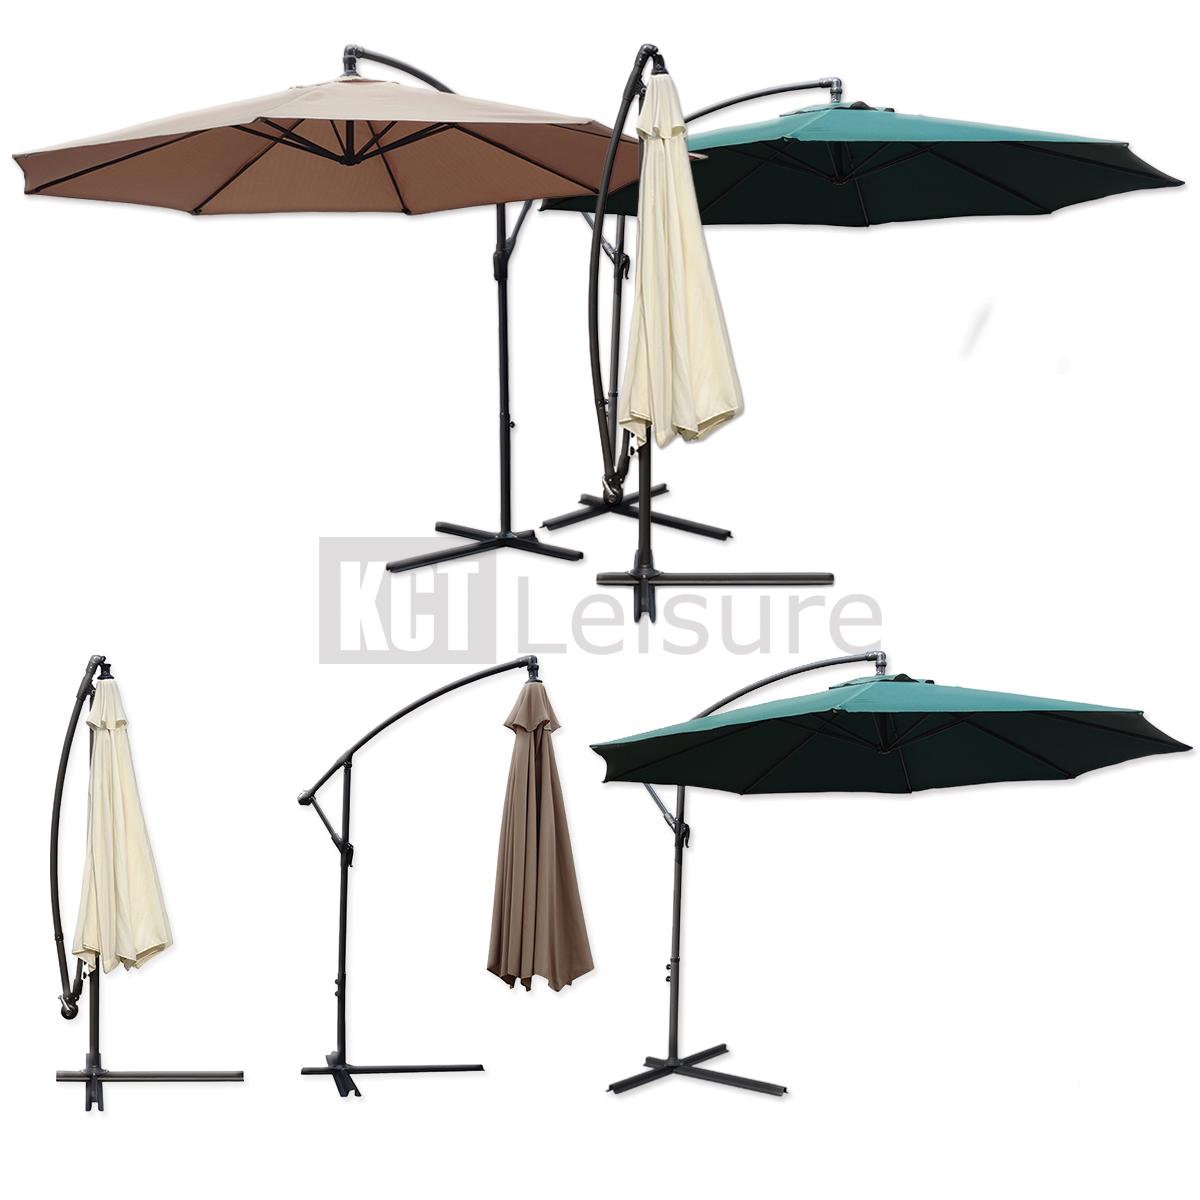 how to close and open maglione cantilever umbrella